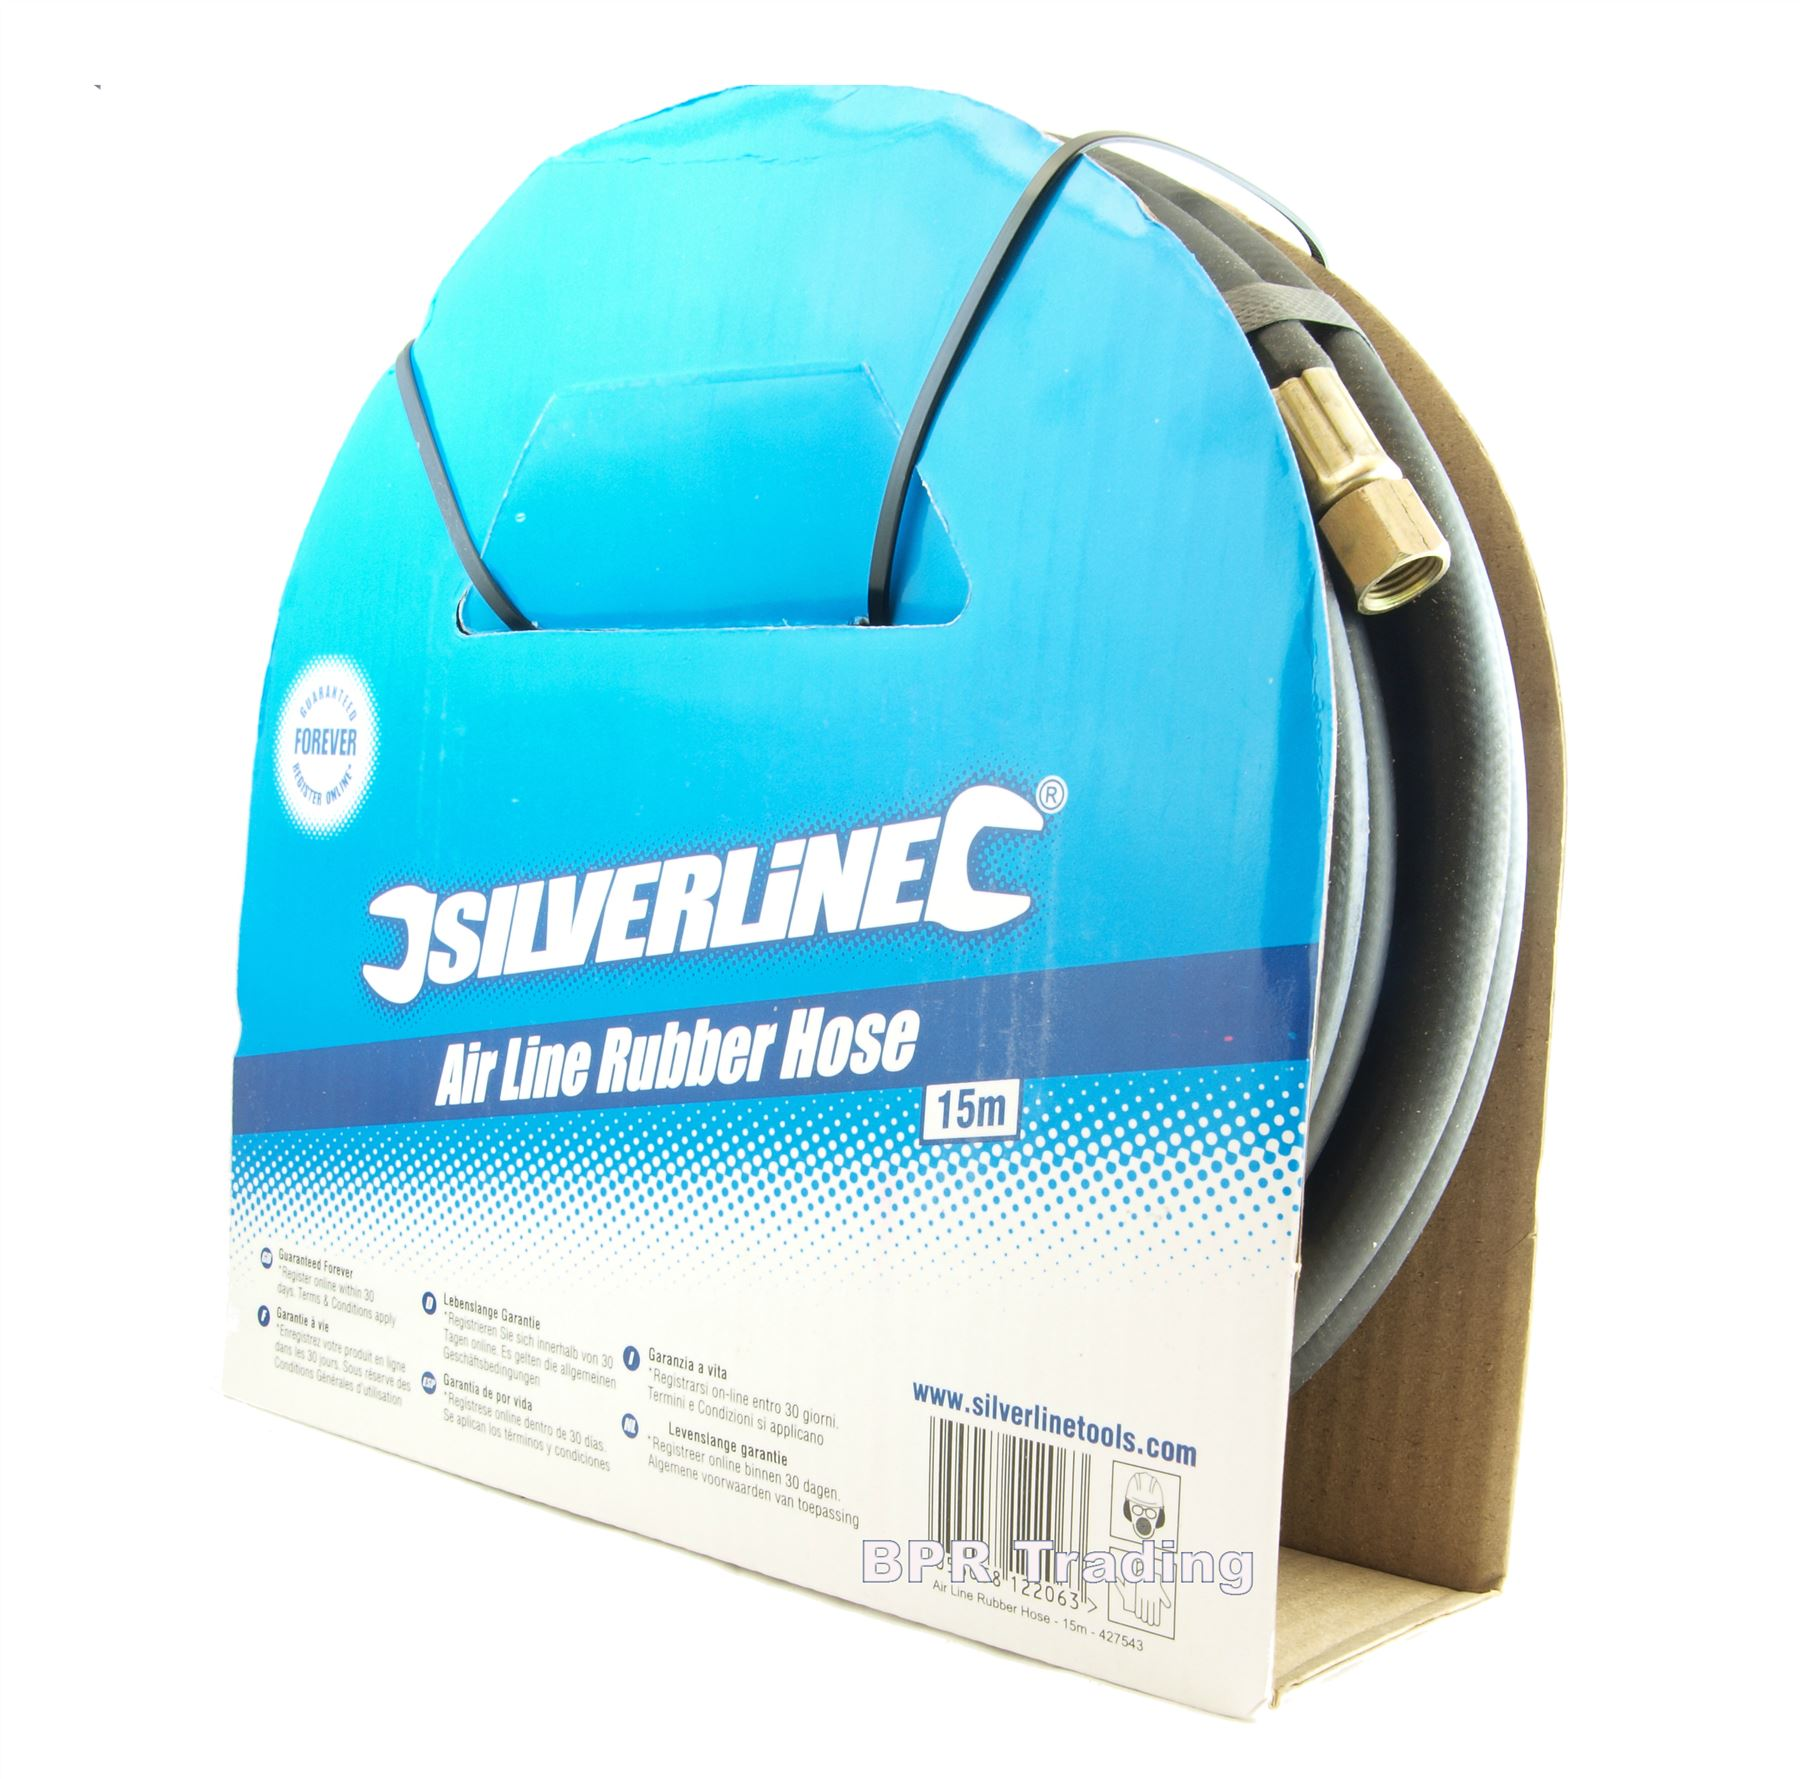 Silverline 633578 Air Line Rubber Hose 10m